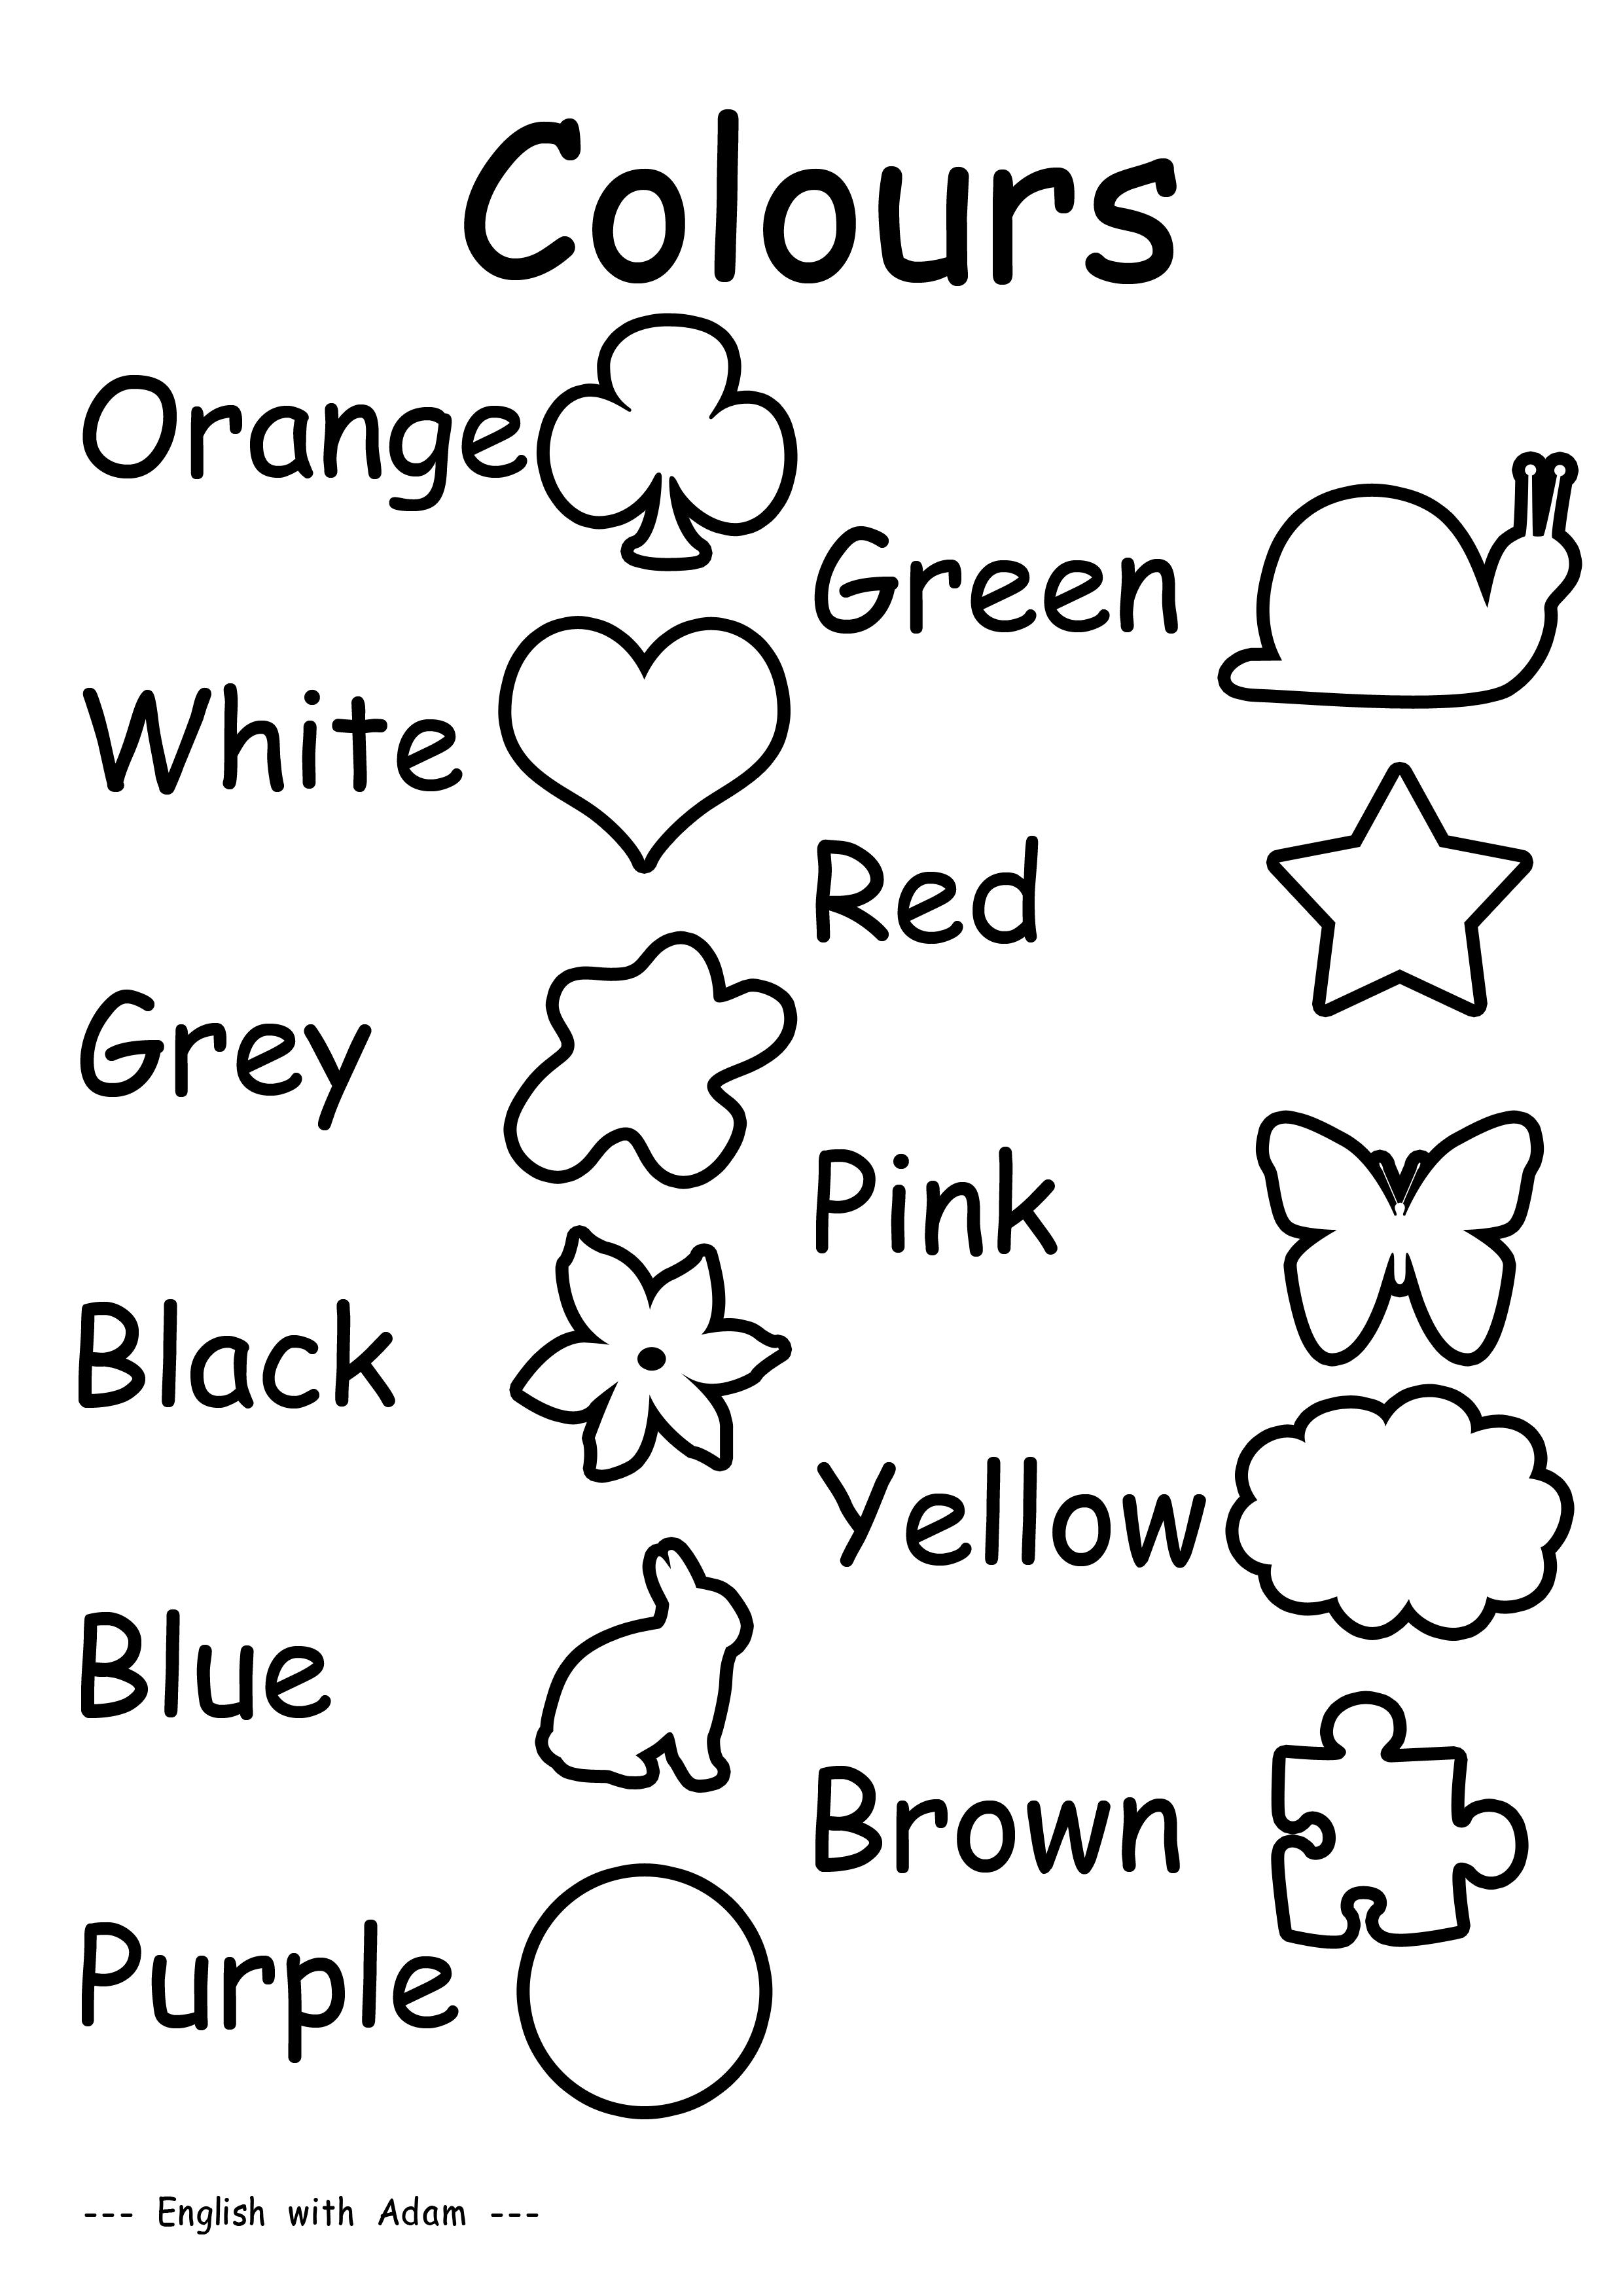 Successful Colour In Worksheets 11871 Taramill  1515